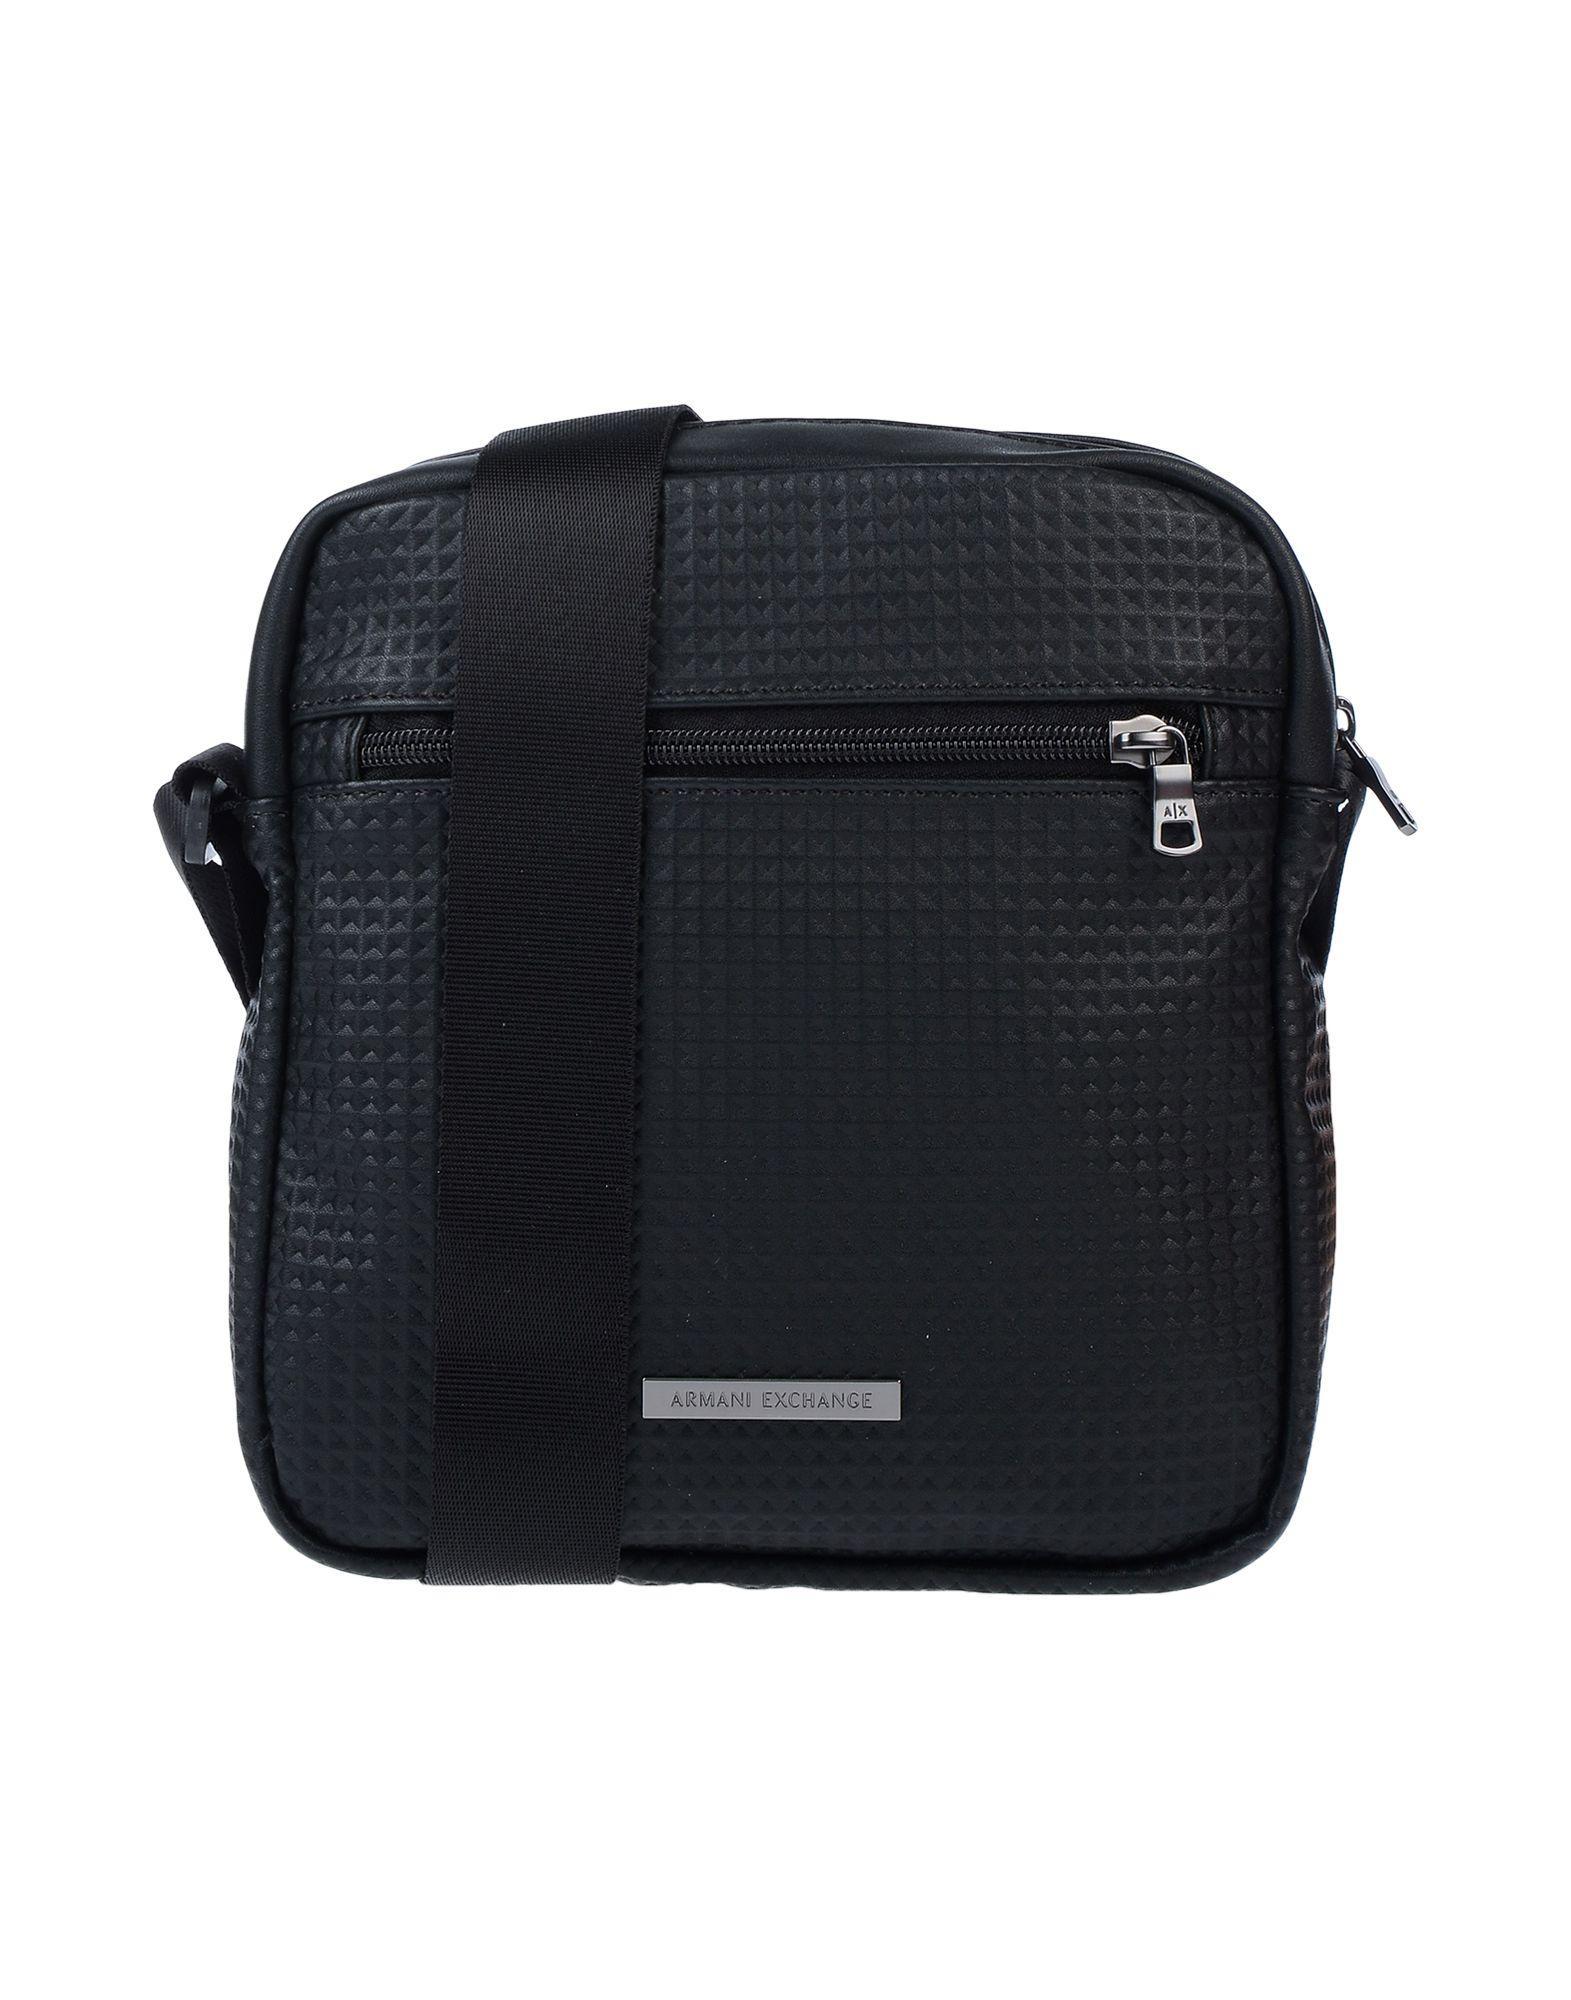 85c63b6d78d7 Armani Exchange - Black Cross-body Bag for Men - Lyst. View fullscreen